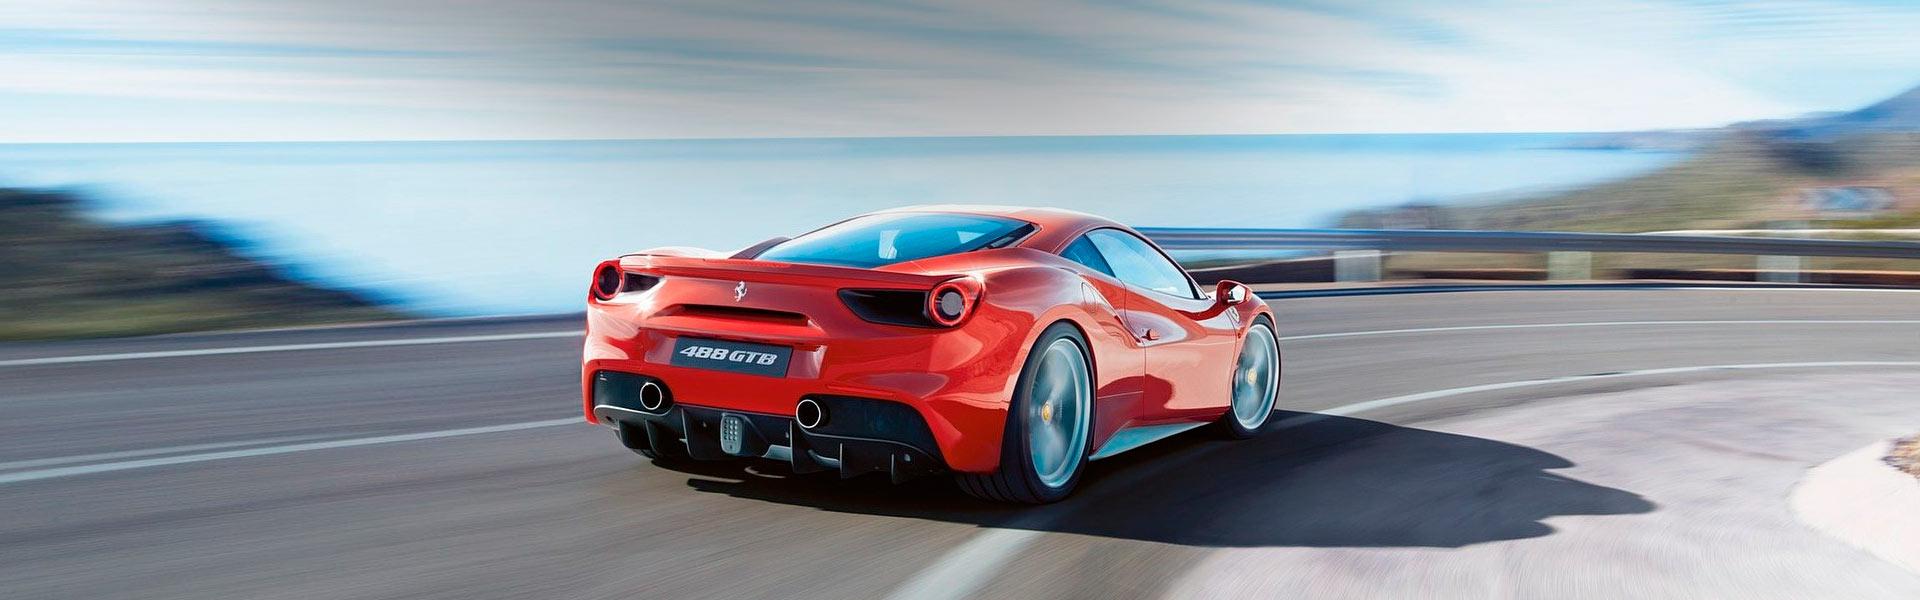 Замена рычагов Ferrari